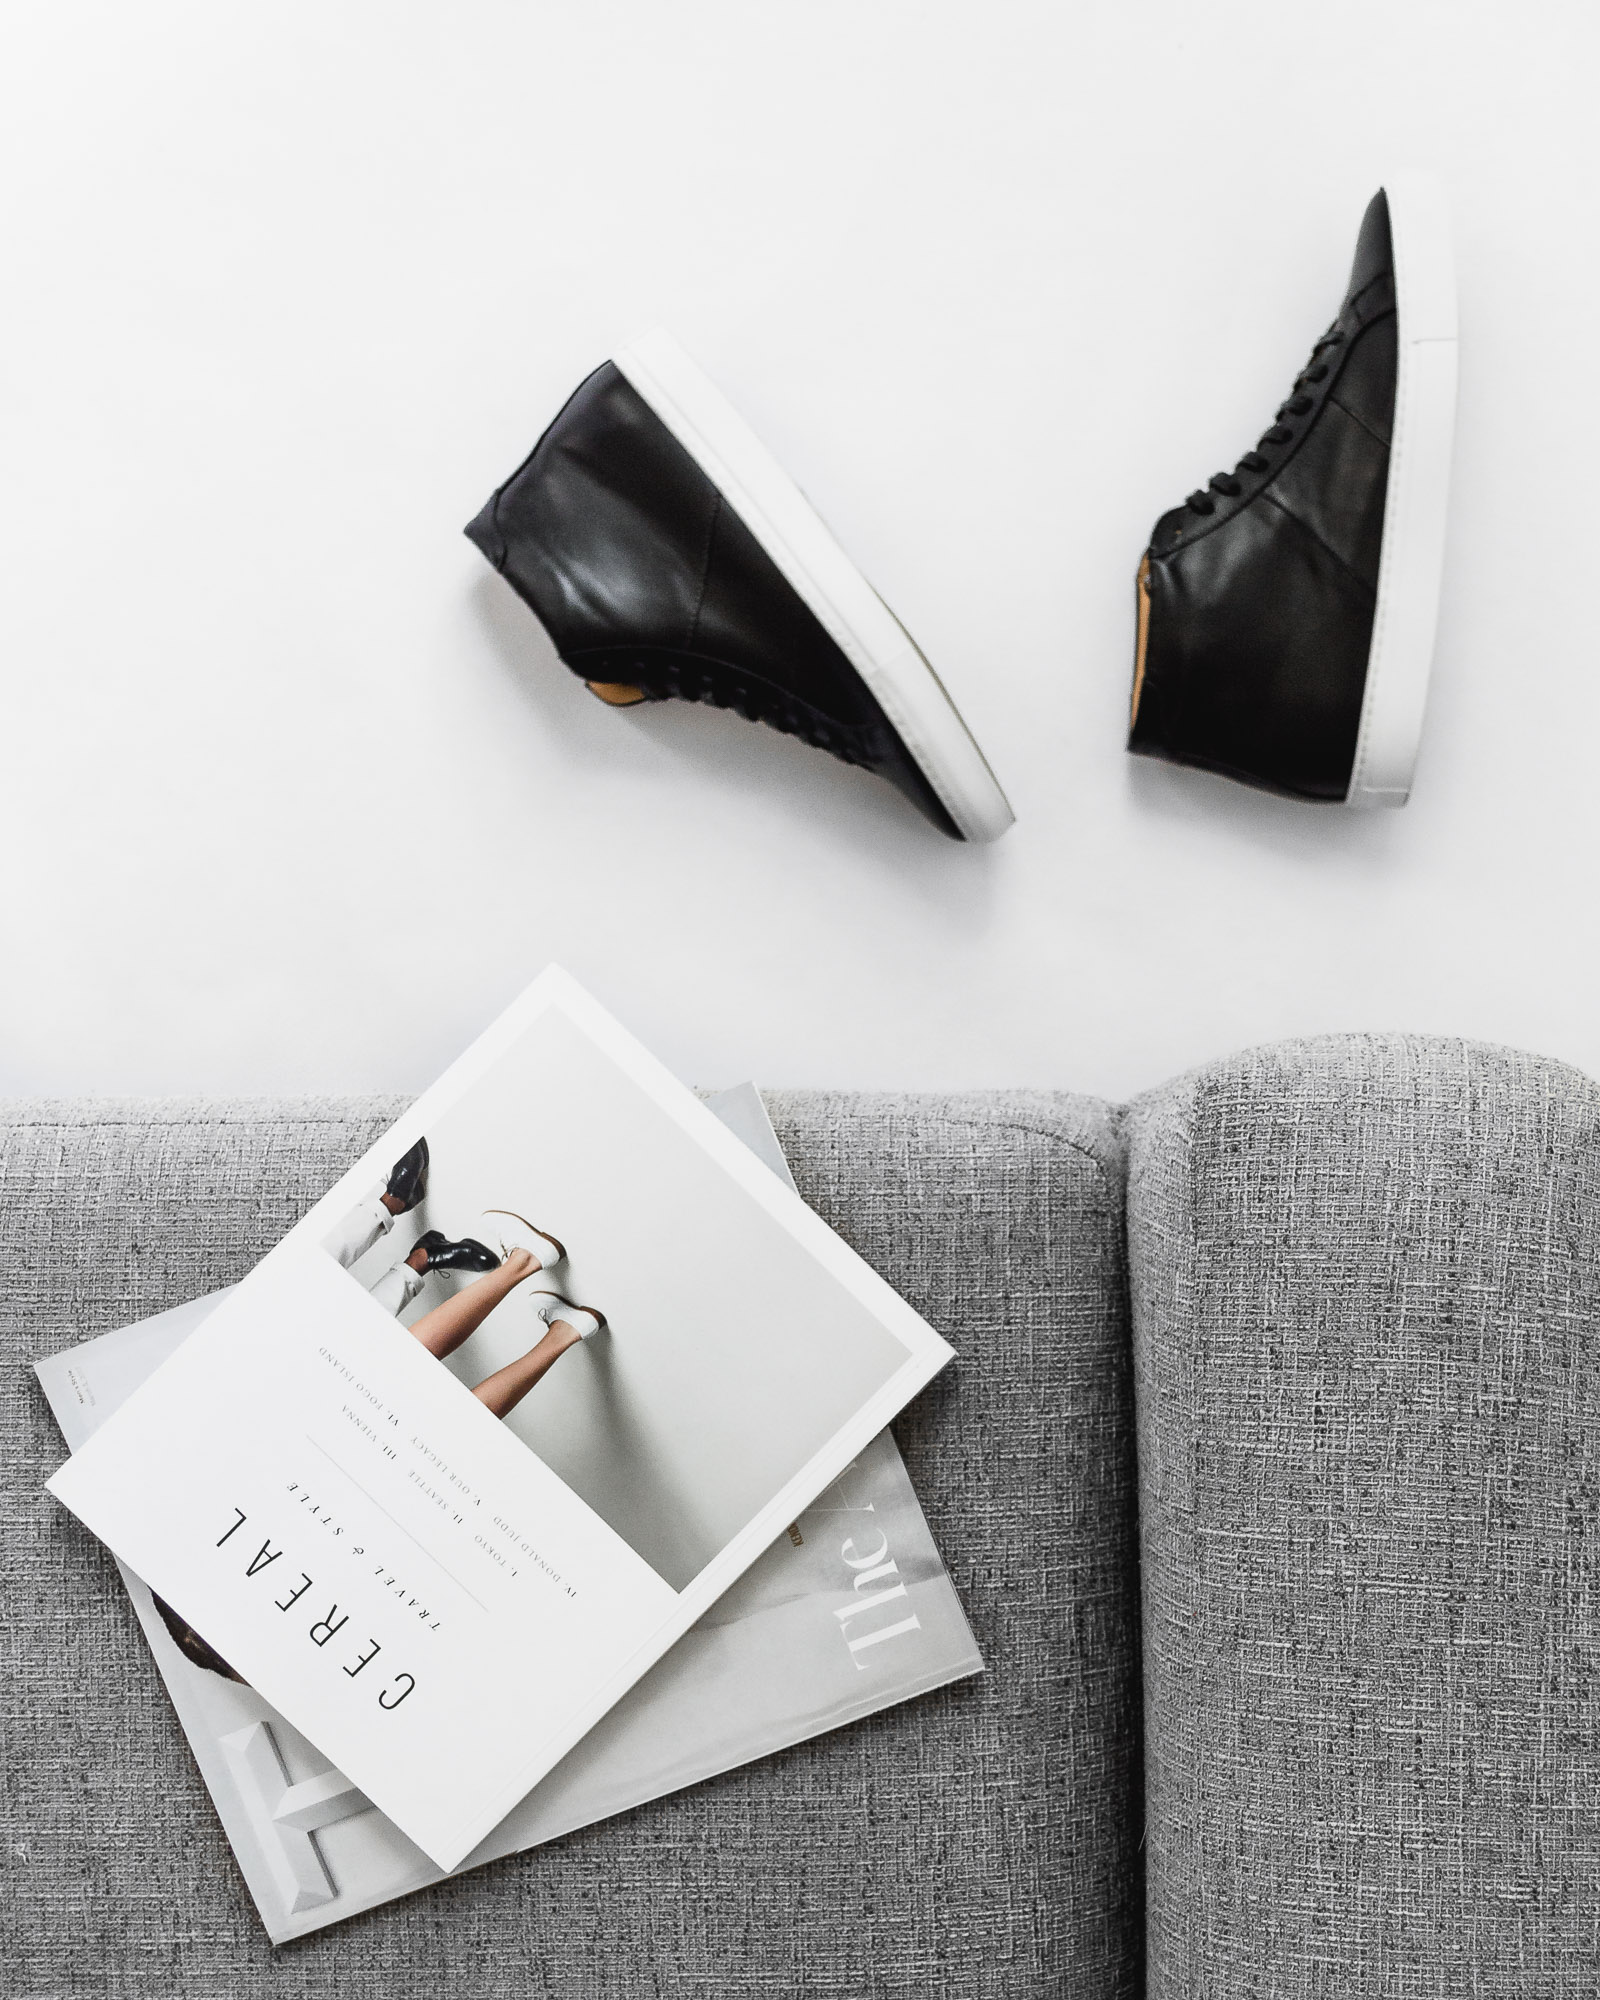 greats brand royale high nero sneaker